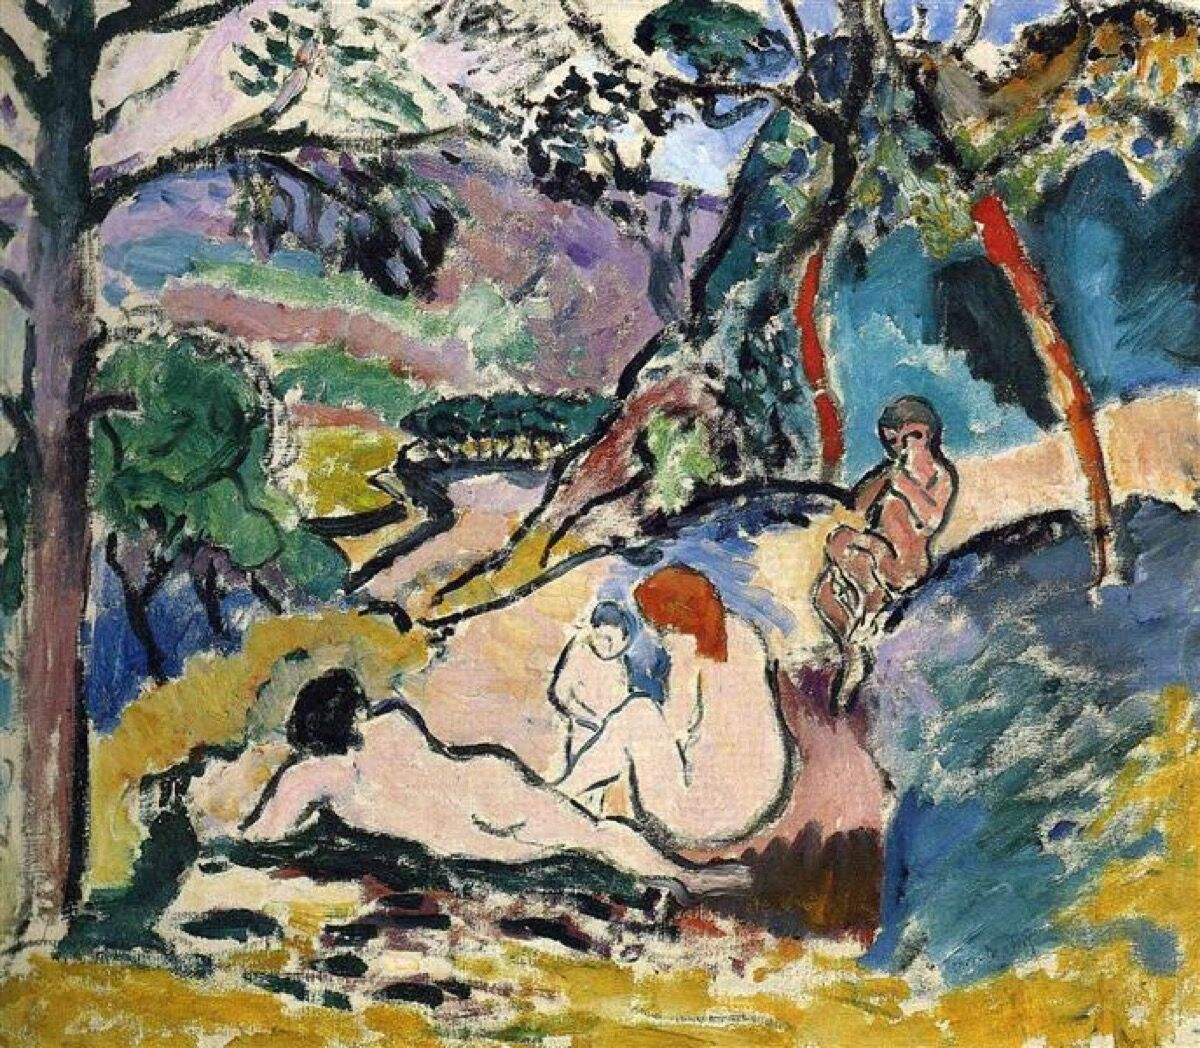 Henri Matisse,La Pastorale (Pastoral), 1905. © Henri Matisse.